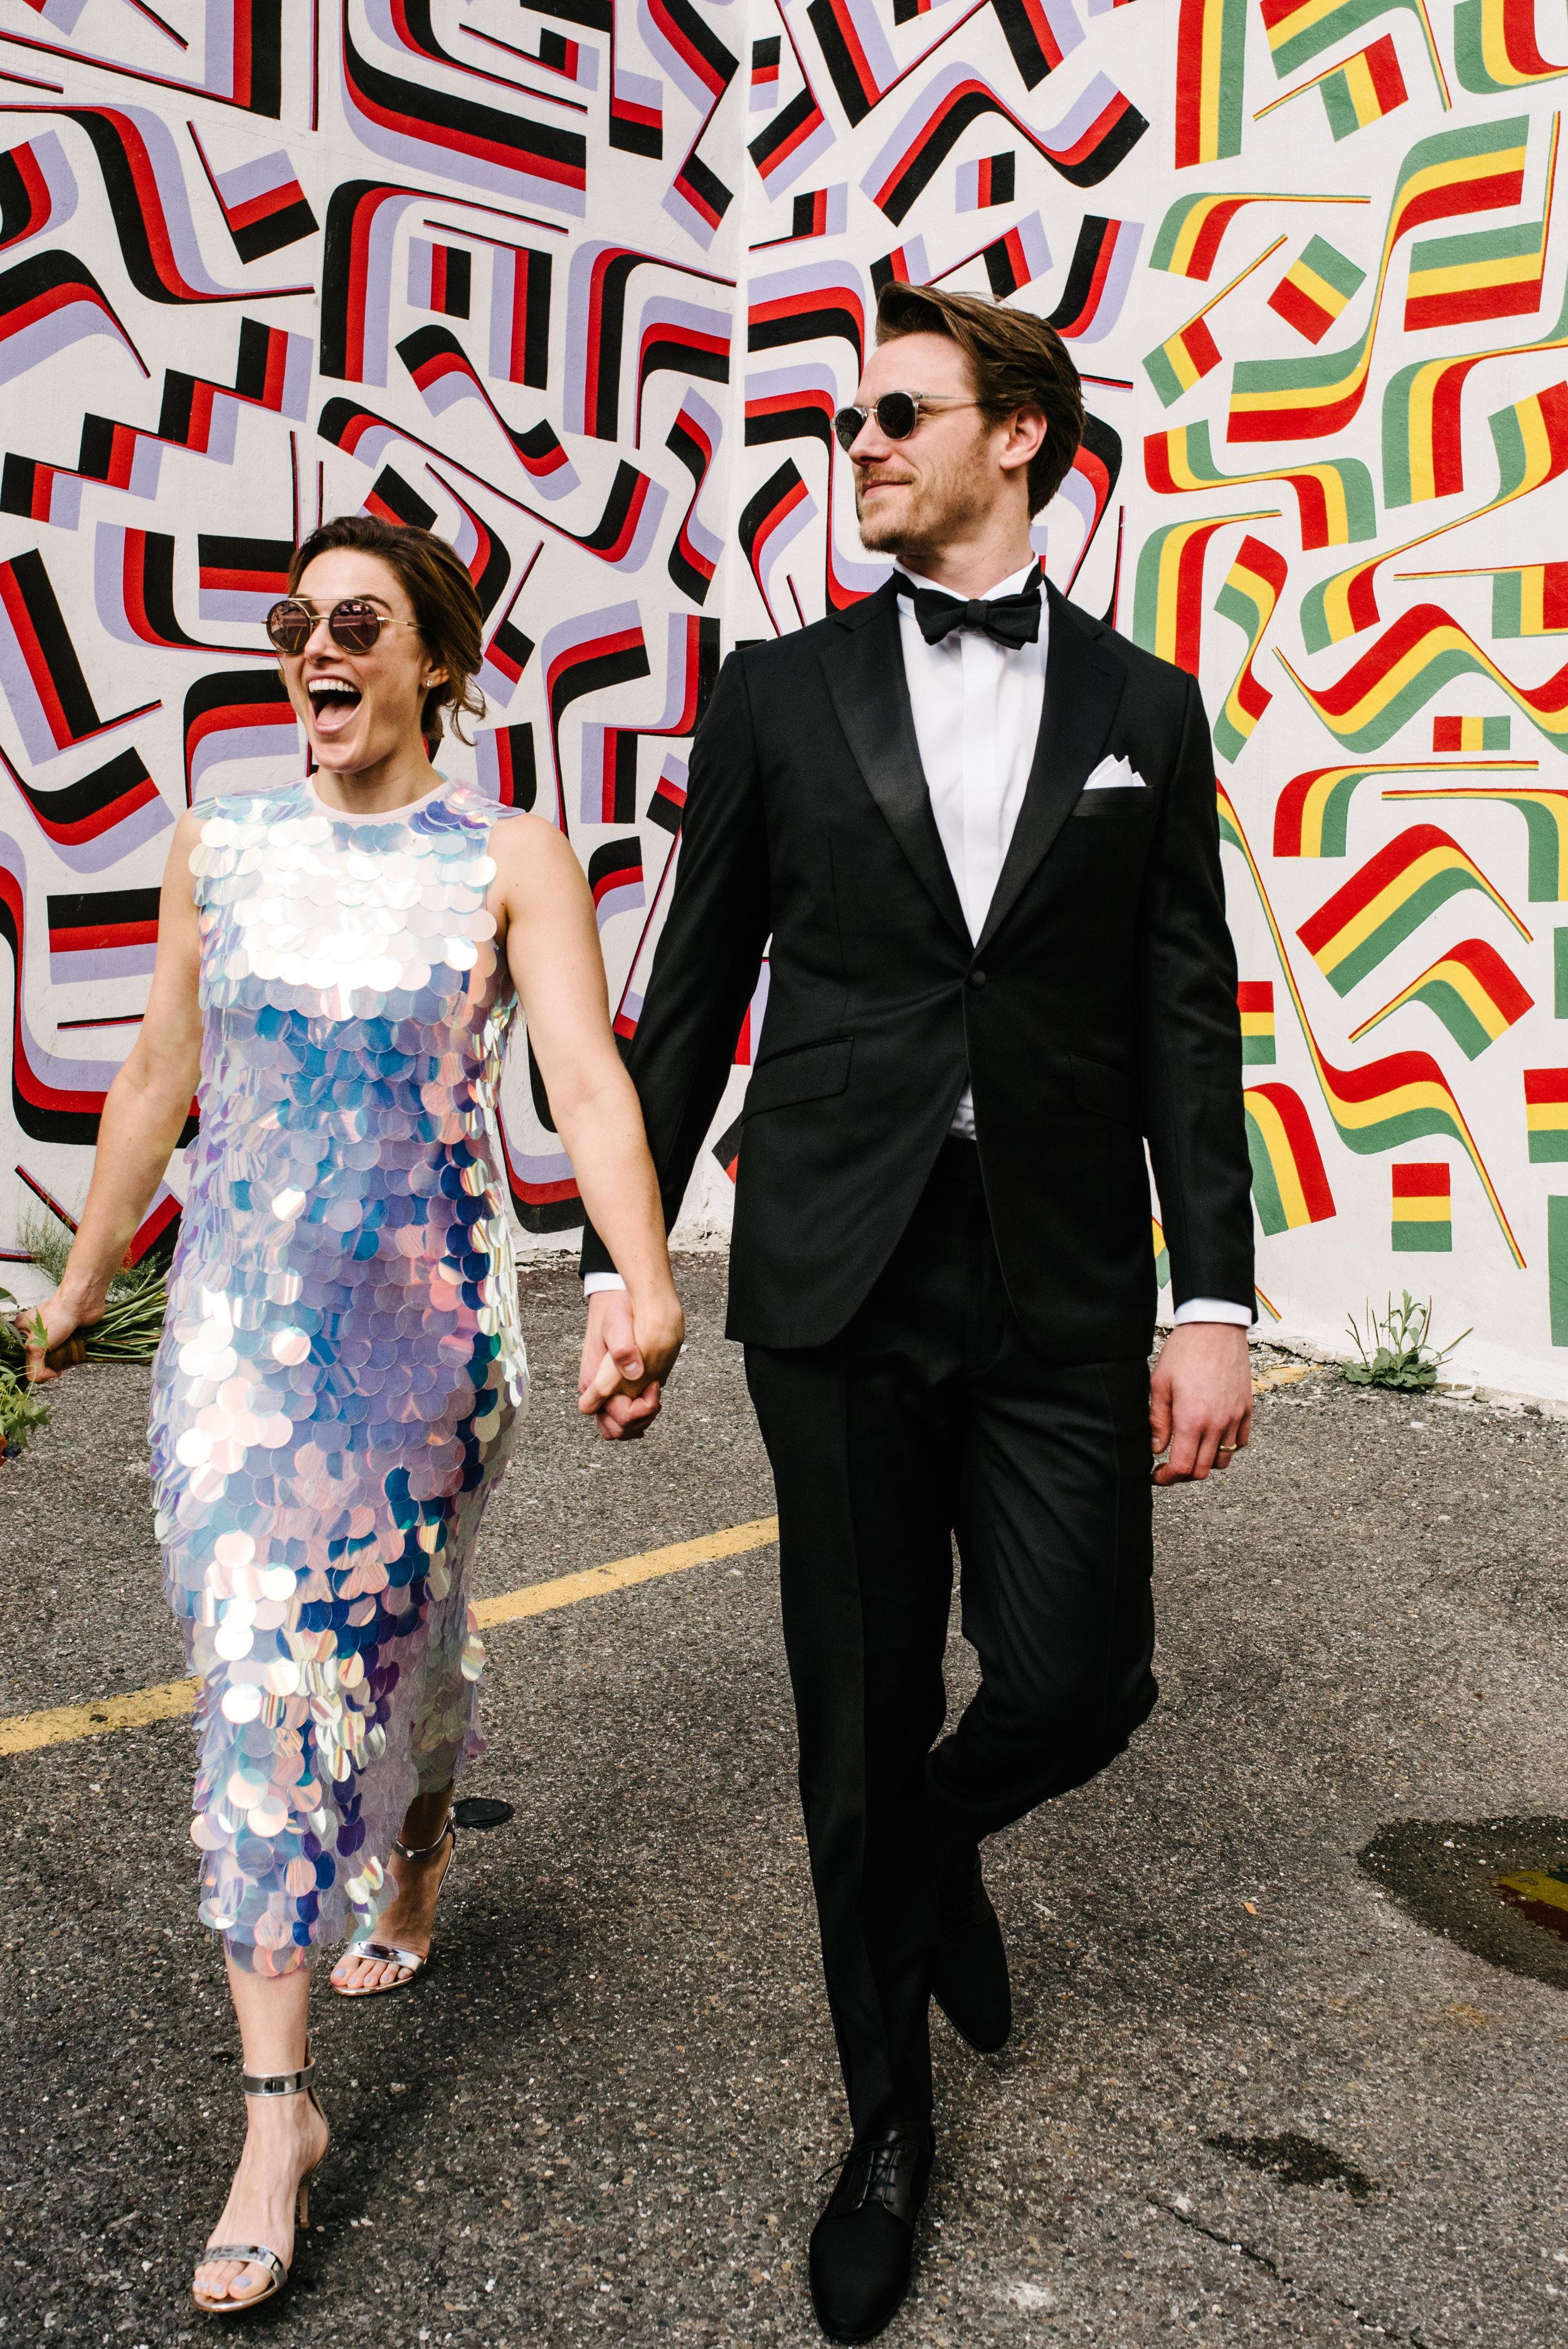 agpcollective_wedding_vernick-4590.jpg